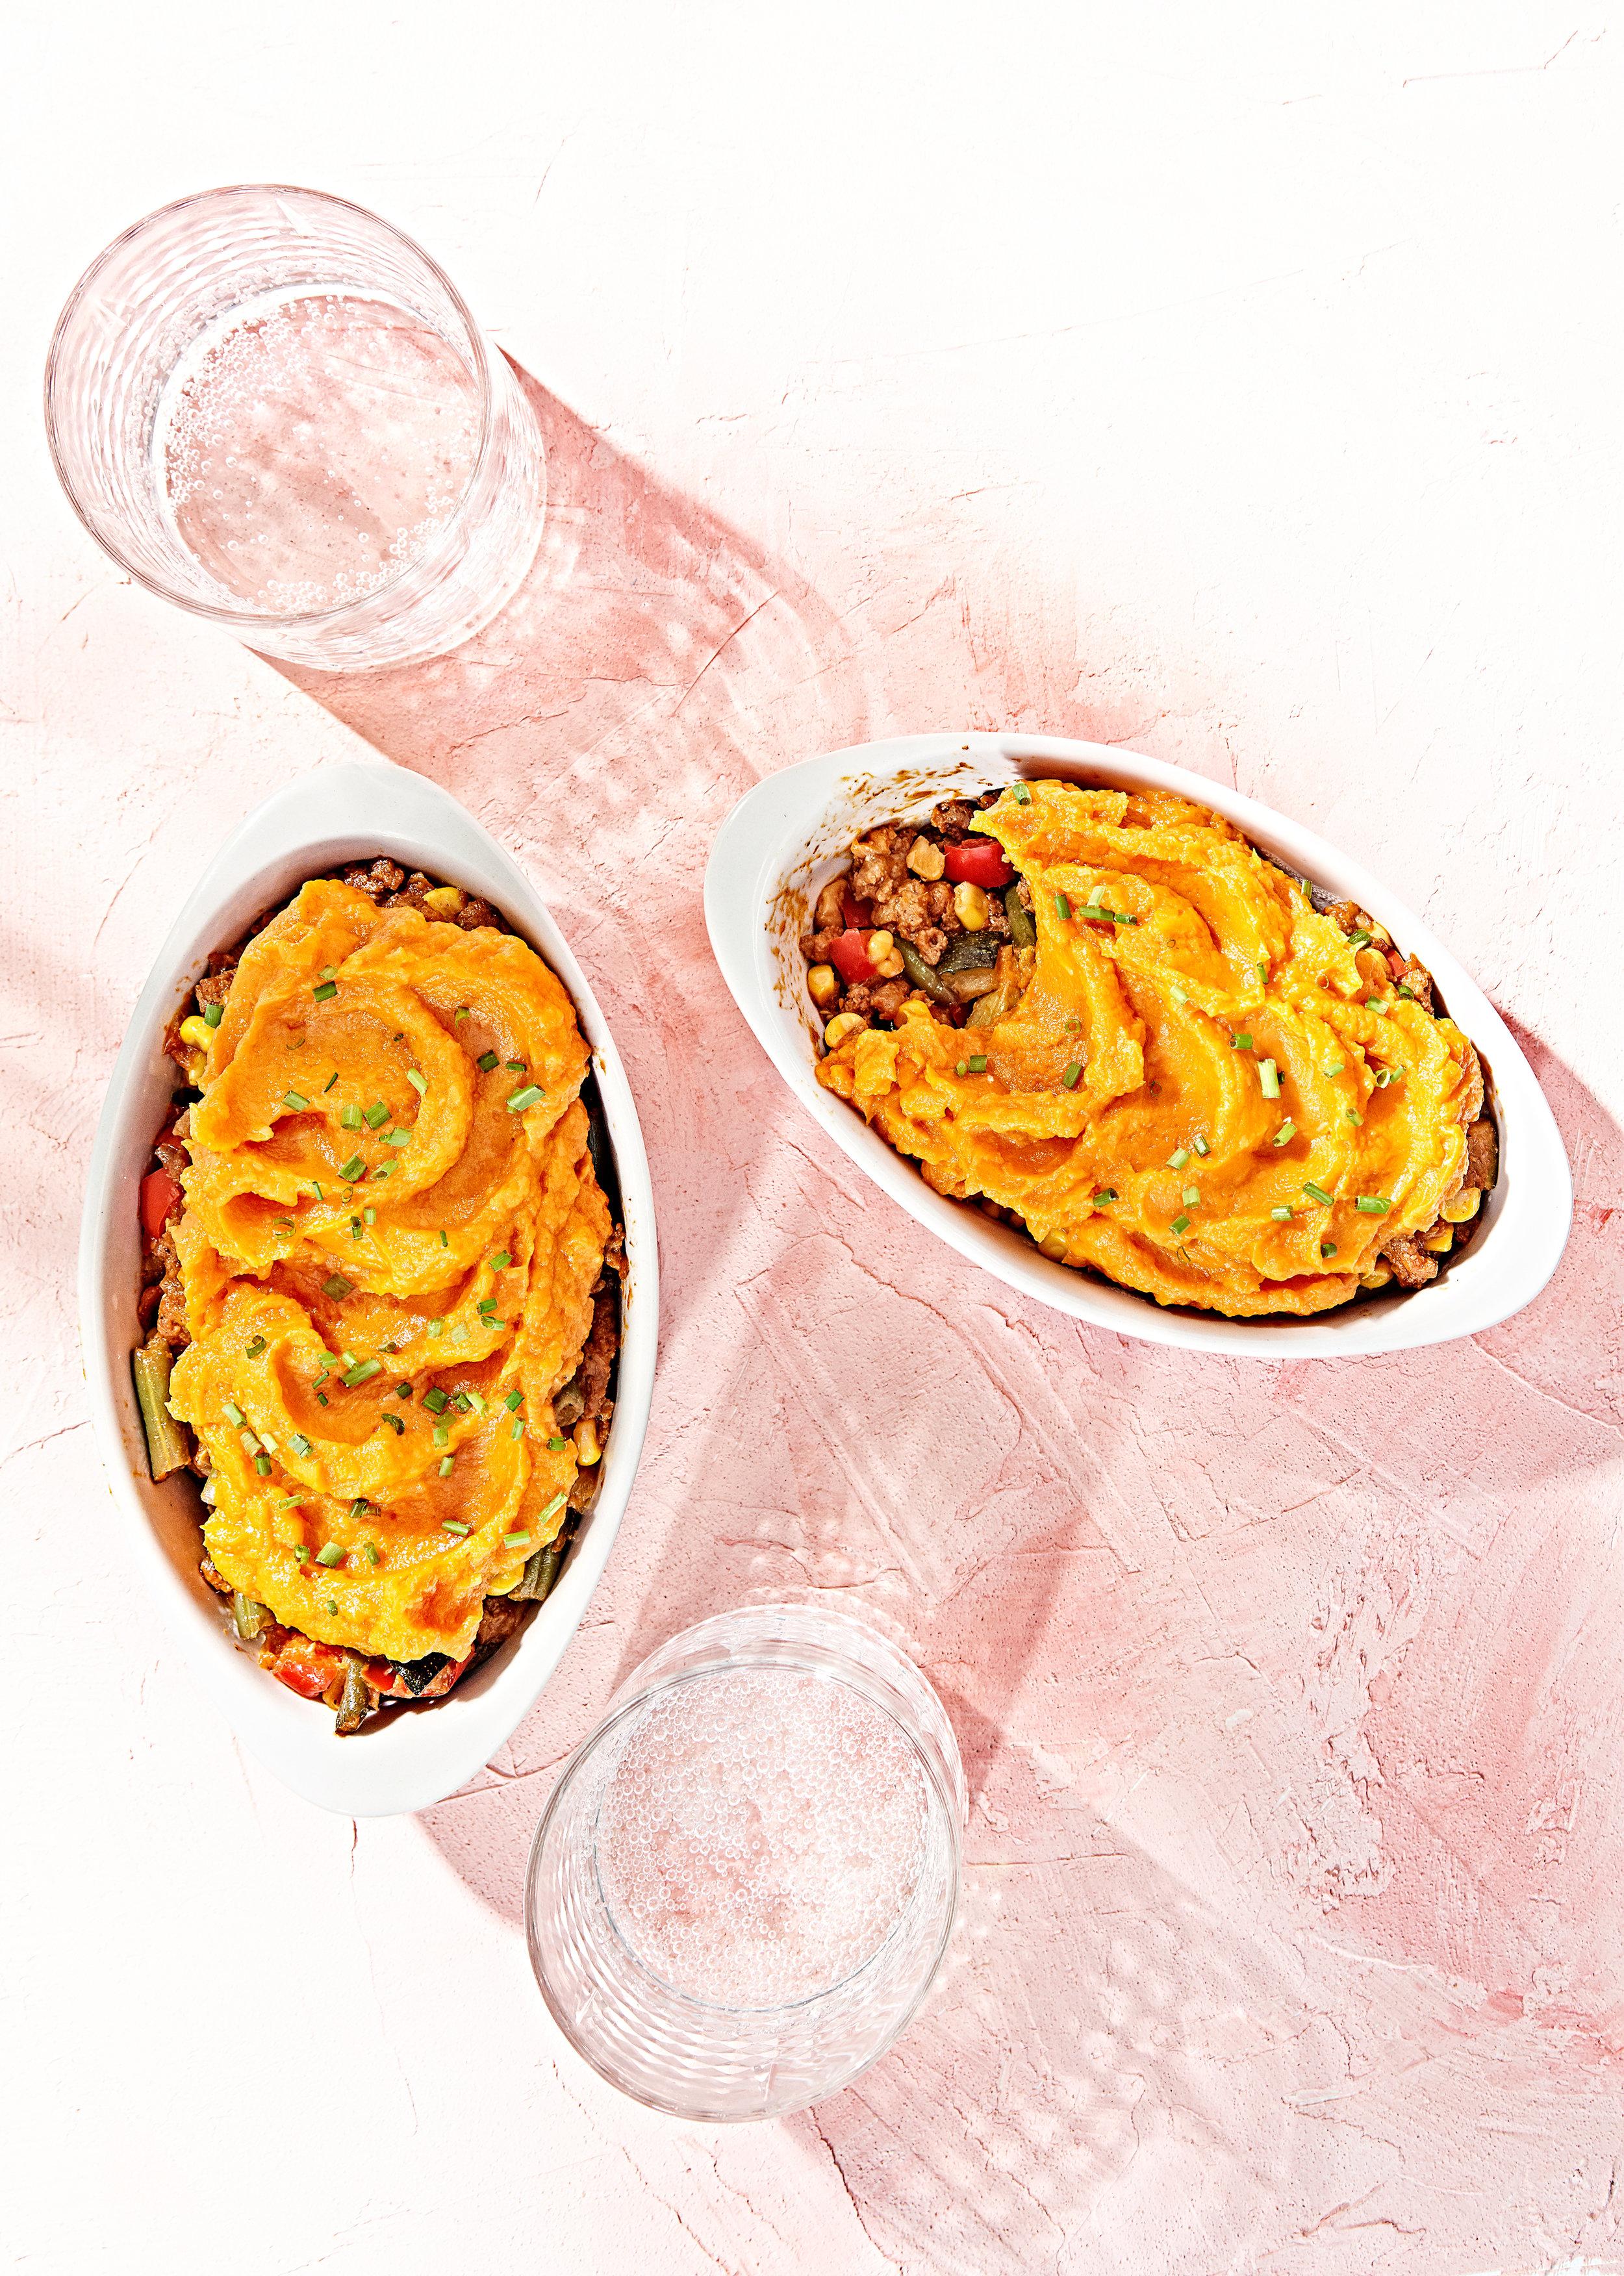 Sweet potato topped shepards pie